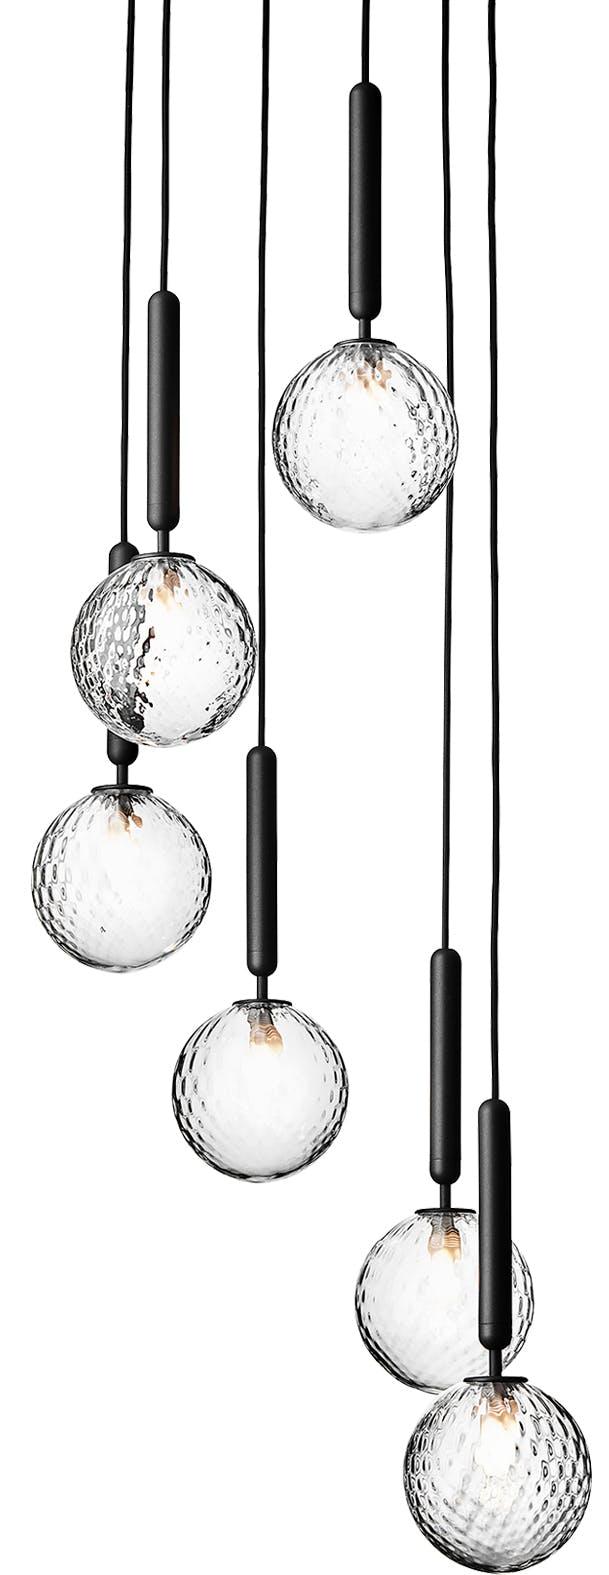 nuura miira 6 chandelier thumb haute living